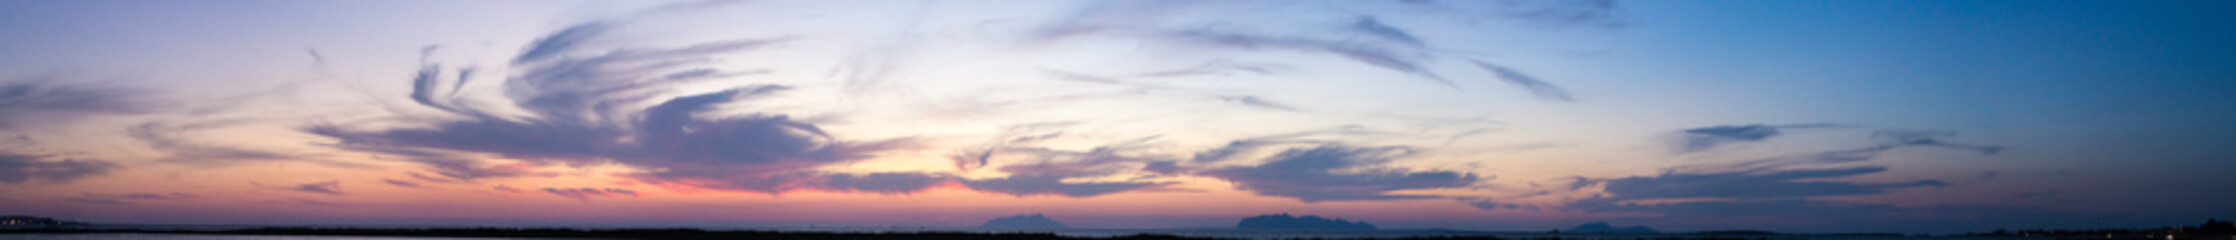 Late Sunset Horizon Sky